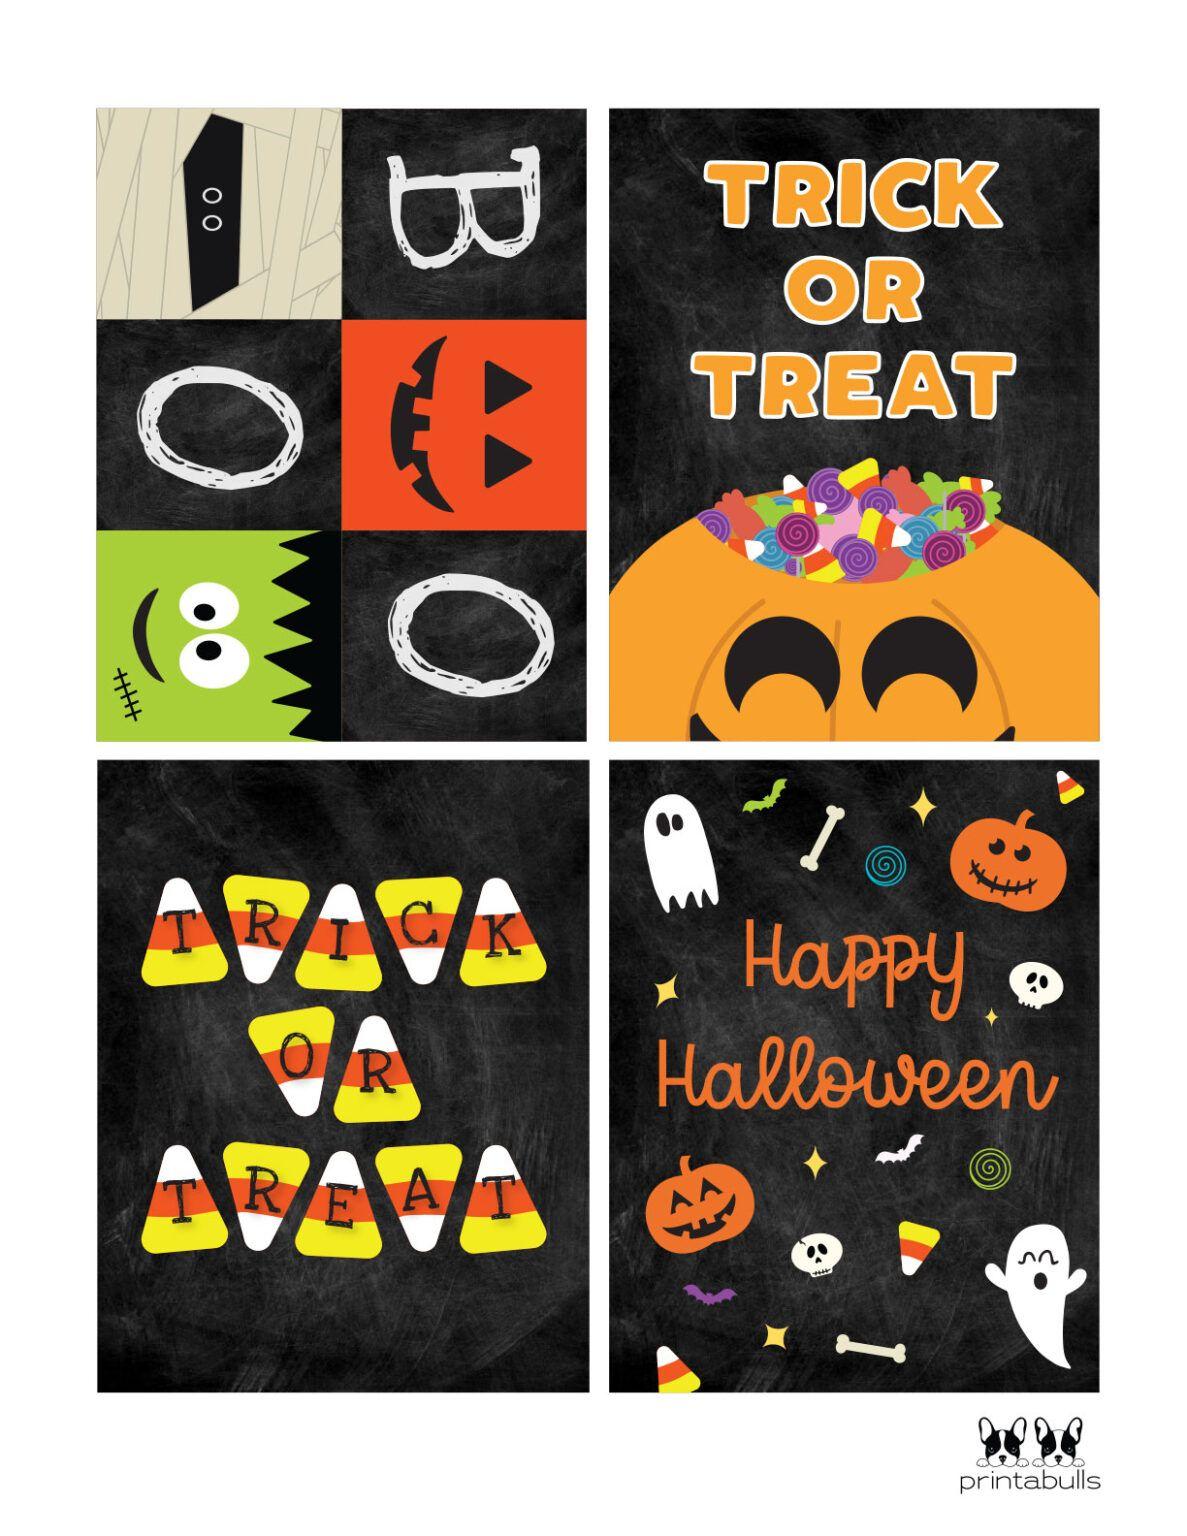 40 Free Printable Halloween Cards Printabulls Free Printable Halloween Cards Happy Halloween Cards Free Printable Halloween